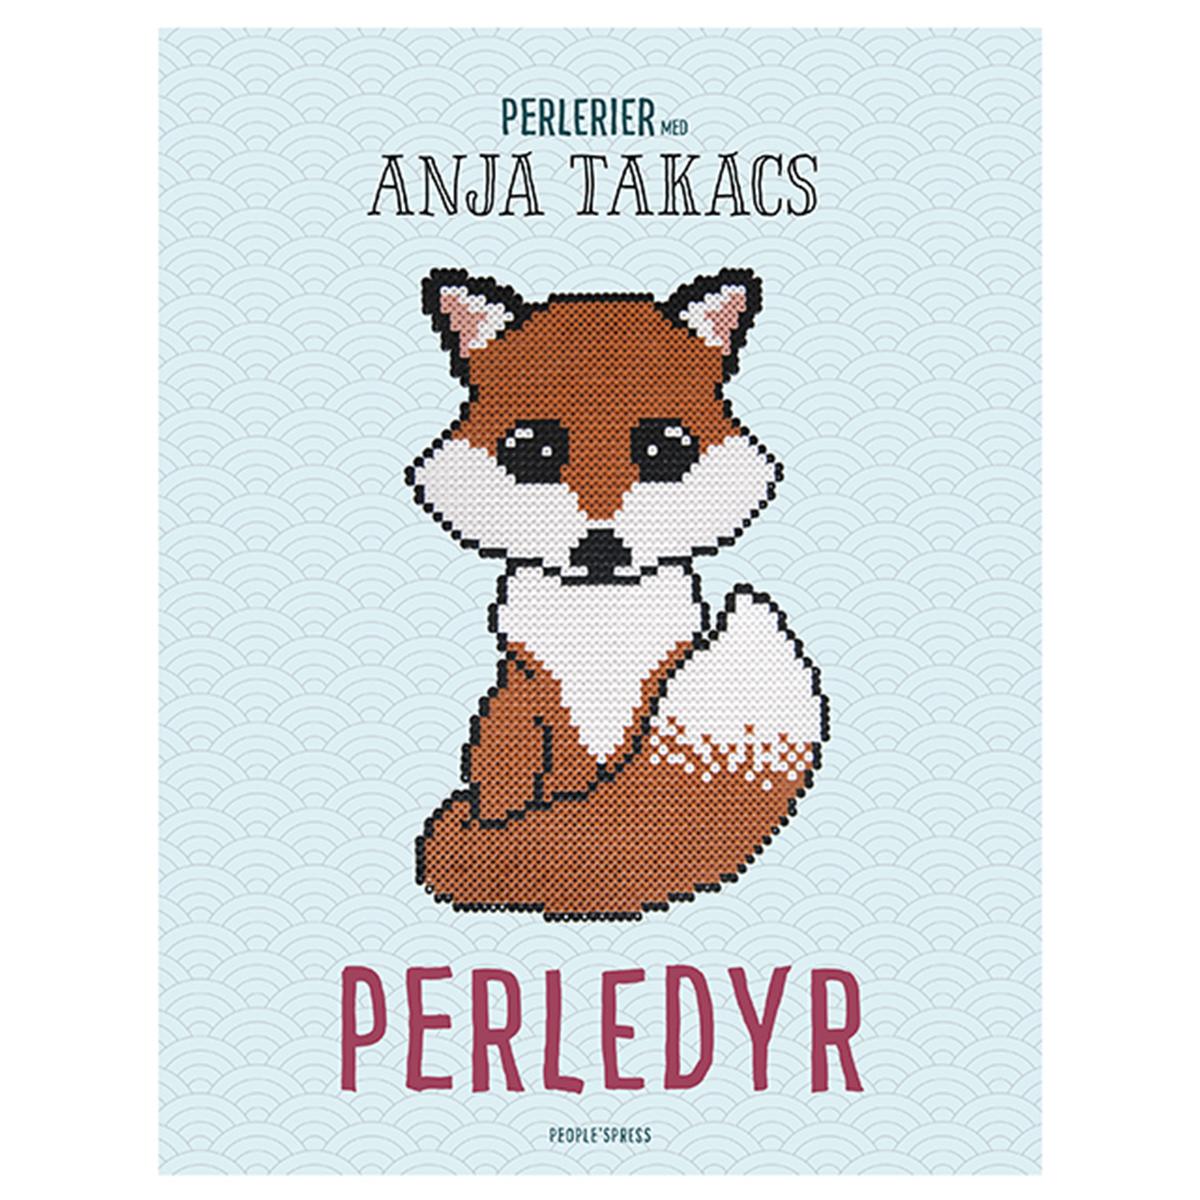 Image of   Perledyr - Perlerier med Anja Takacs 1 - Indbundet